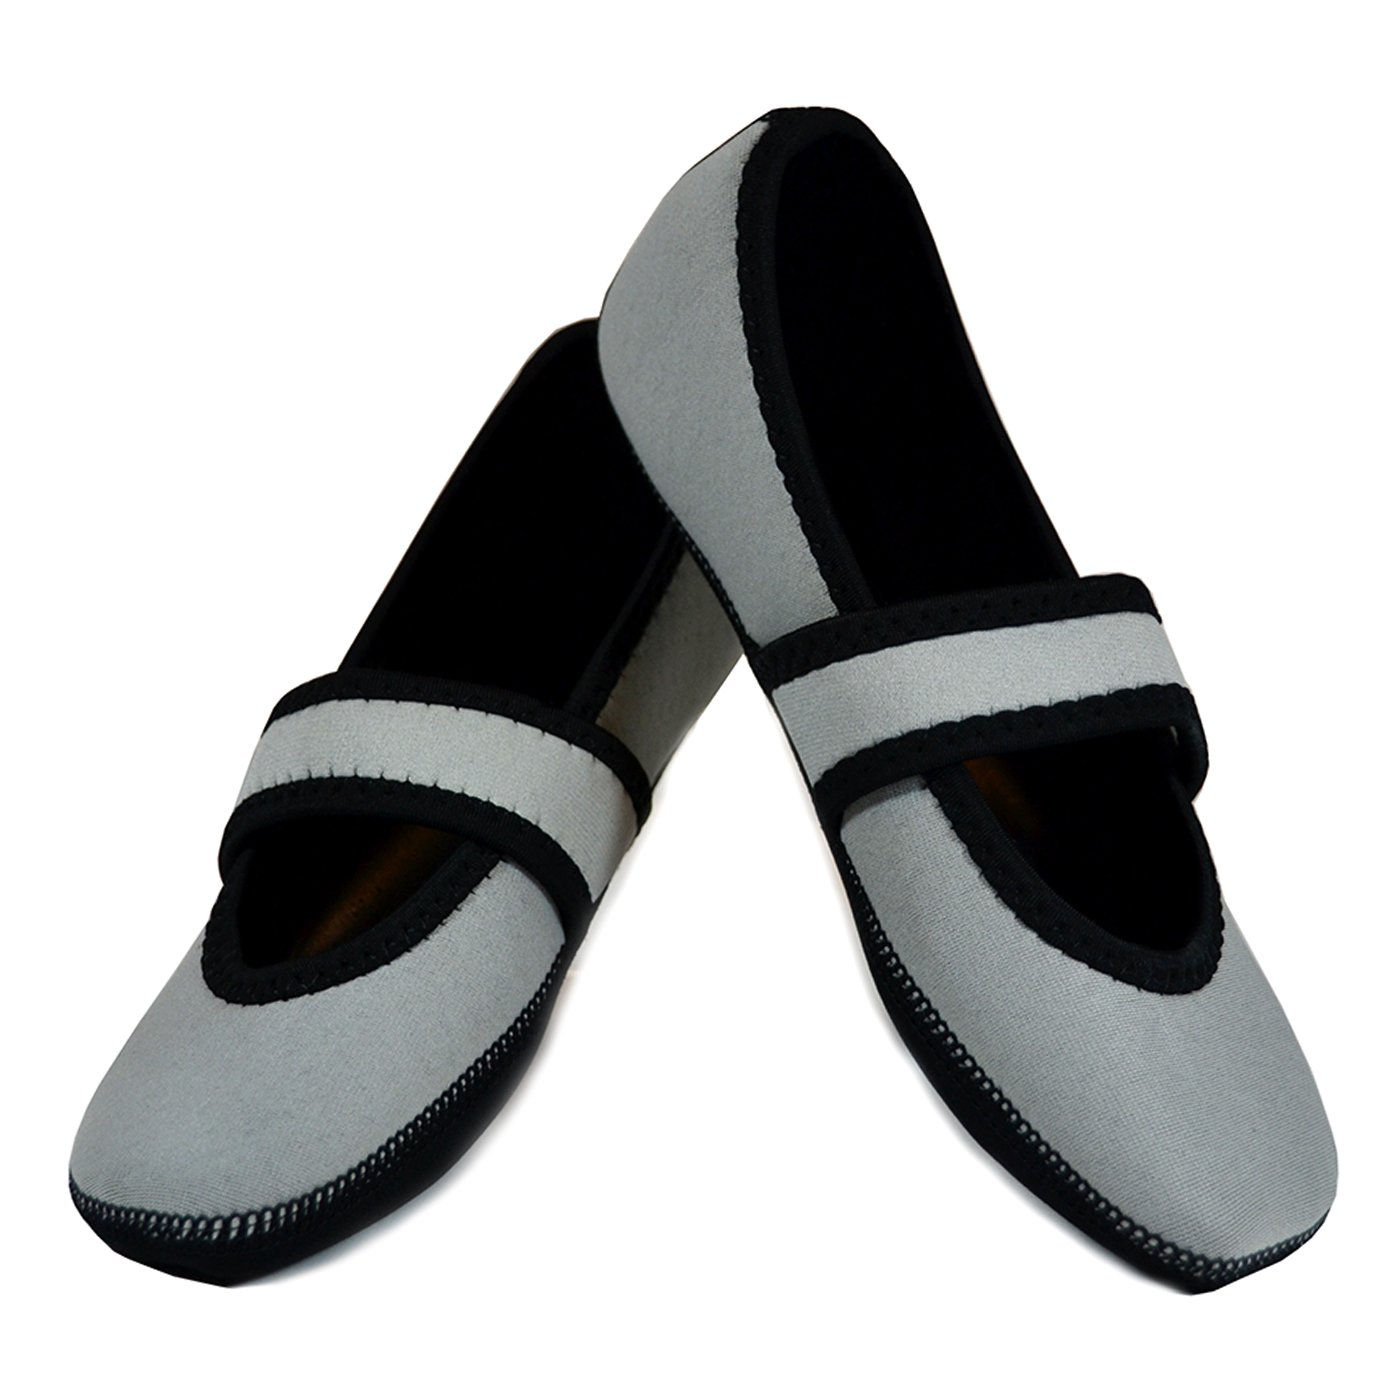 Nufoot Betsy Lou Women's Shoes, Best Foldable & Flexible Flats, Slipper Socks, Travel Slippers & Exercise Shoes, Dance Shoes, Yoga Socks, House Shoes, Indoor Slippers, Gray, Large